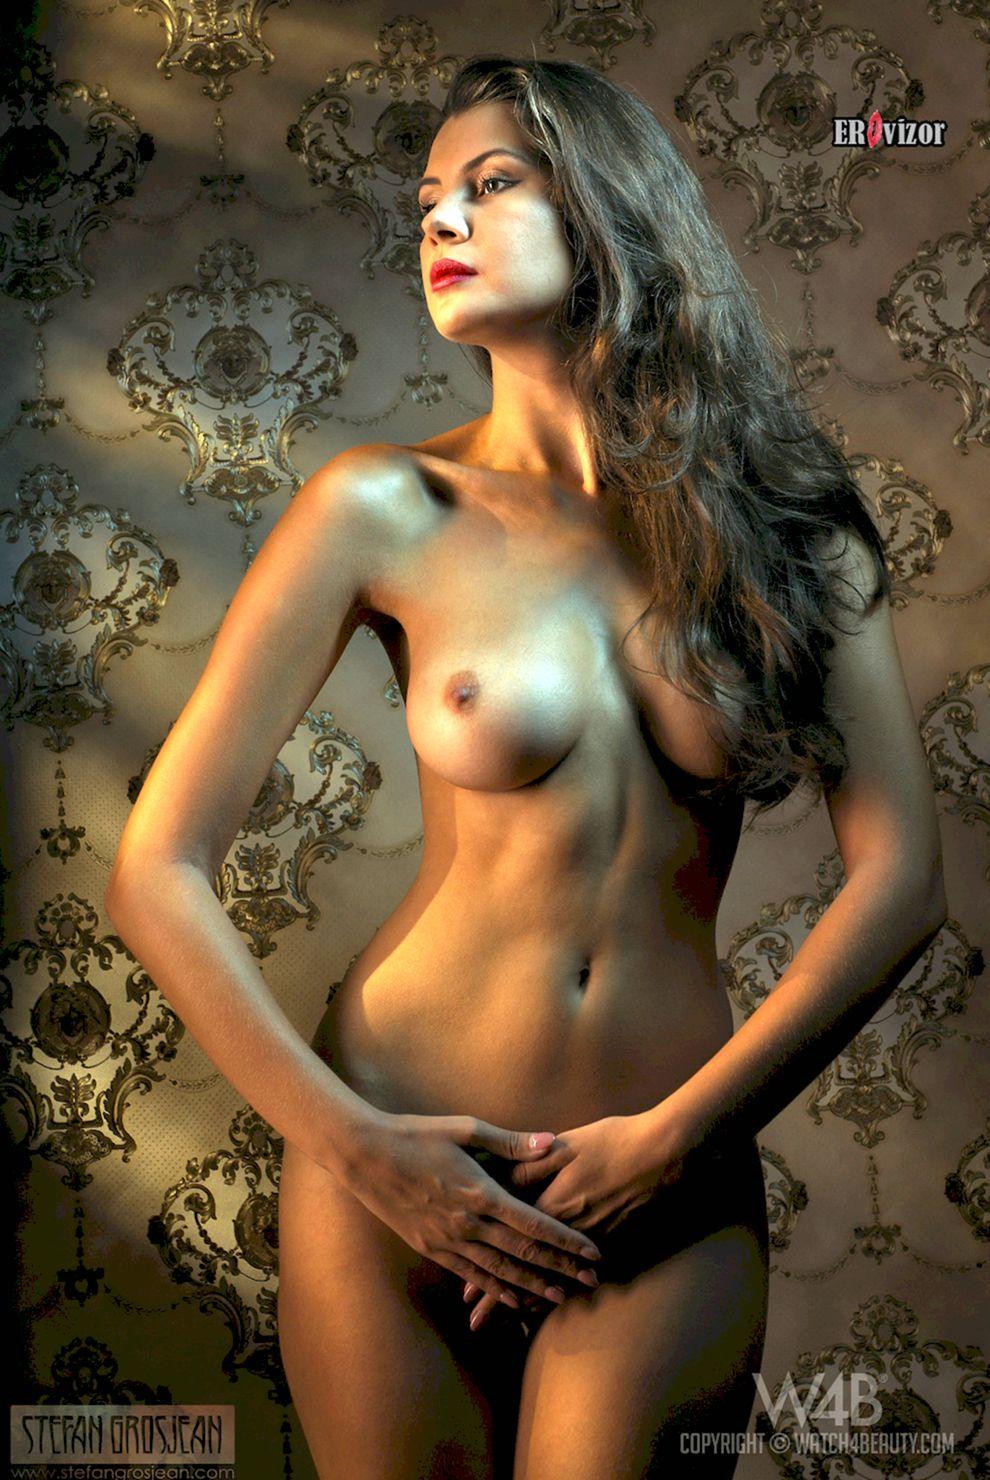 legkaya_erotica-erovizor (58)